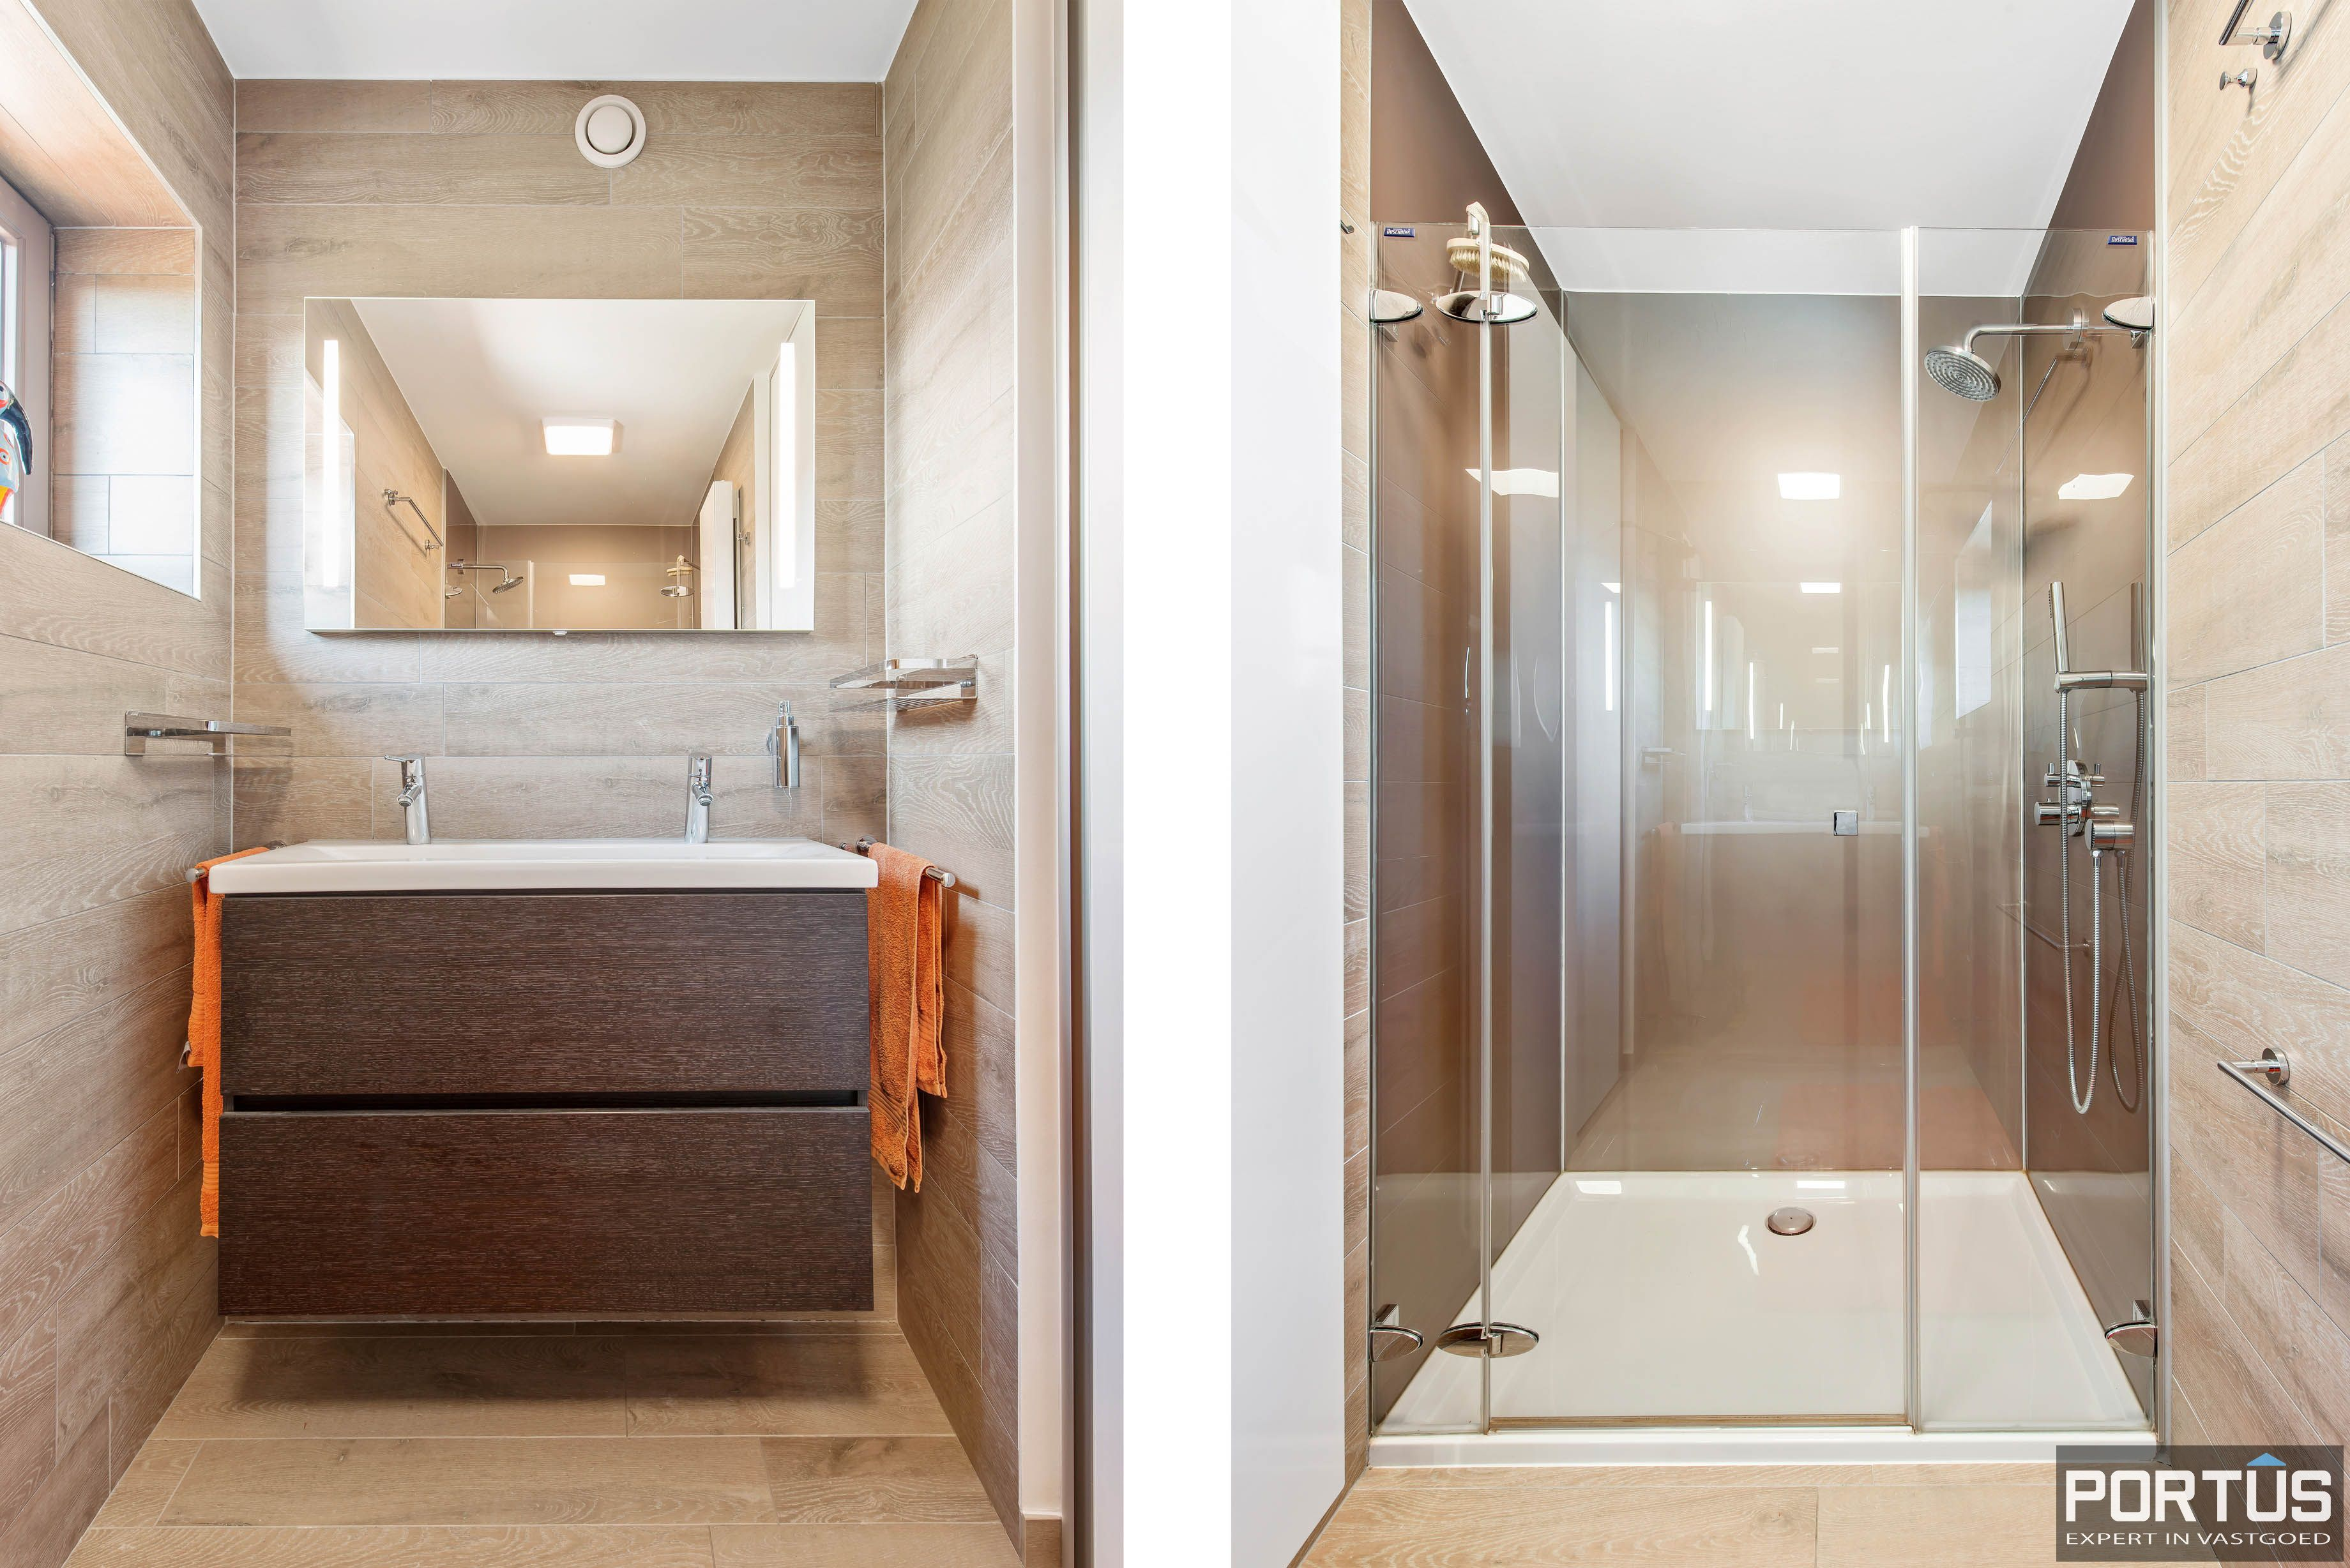 Exclusieve penthouse met 3 slaapkamers te koop te Nieuwpoort - 10940